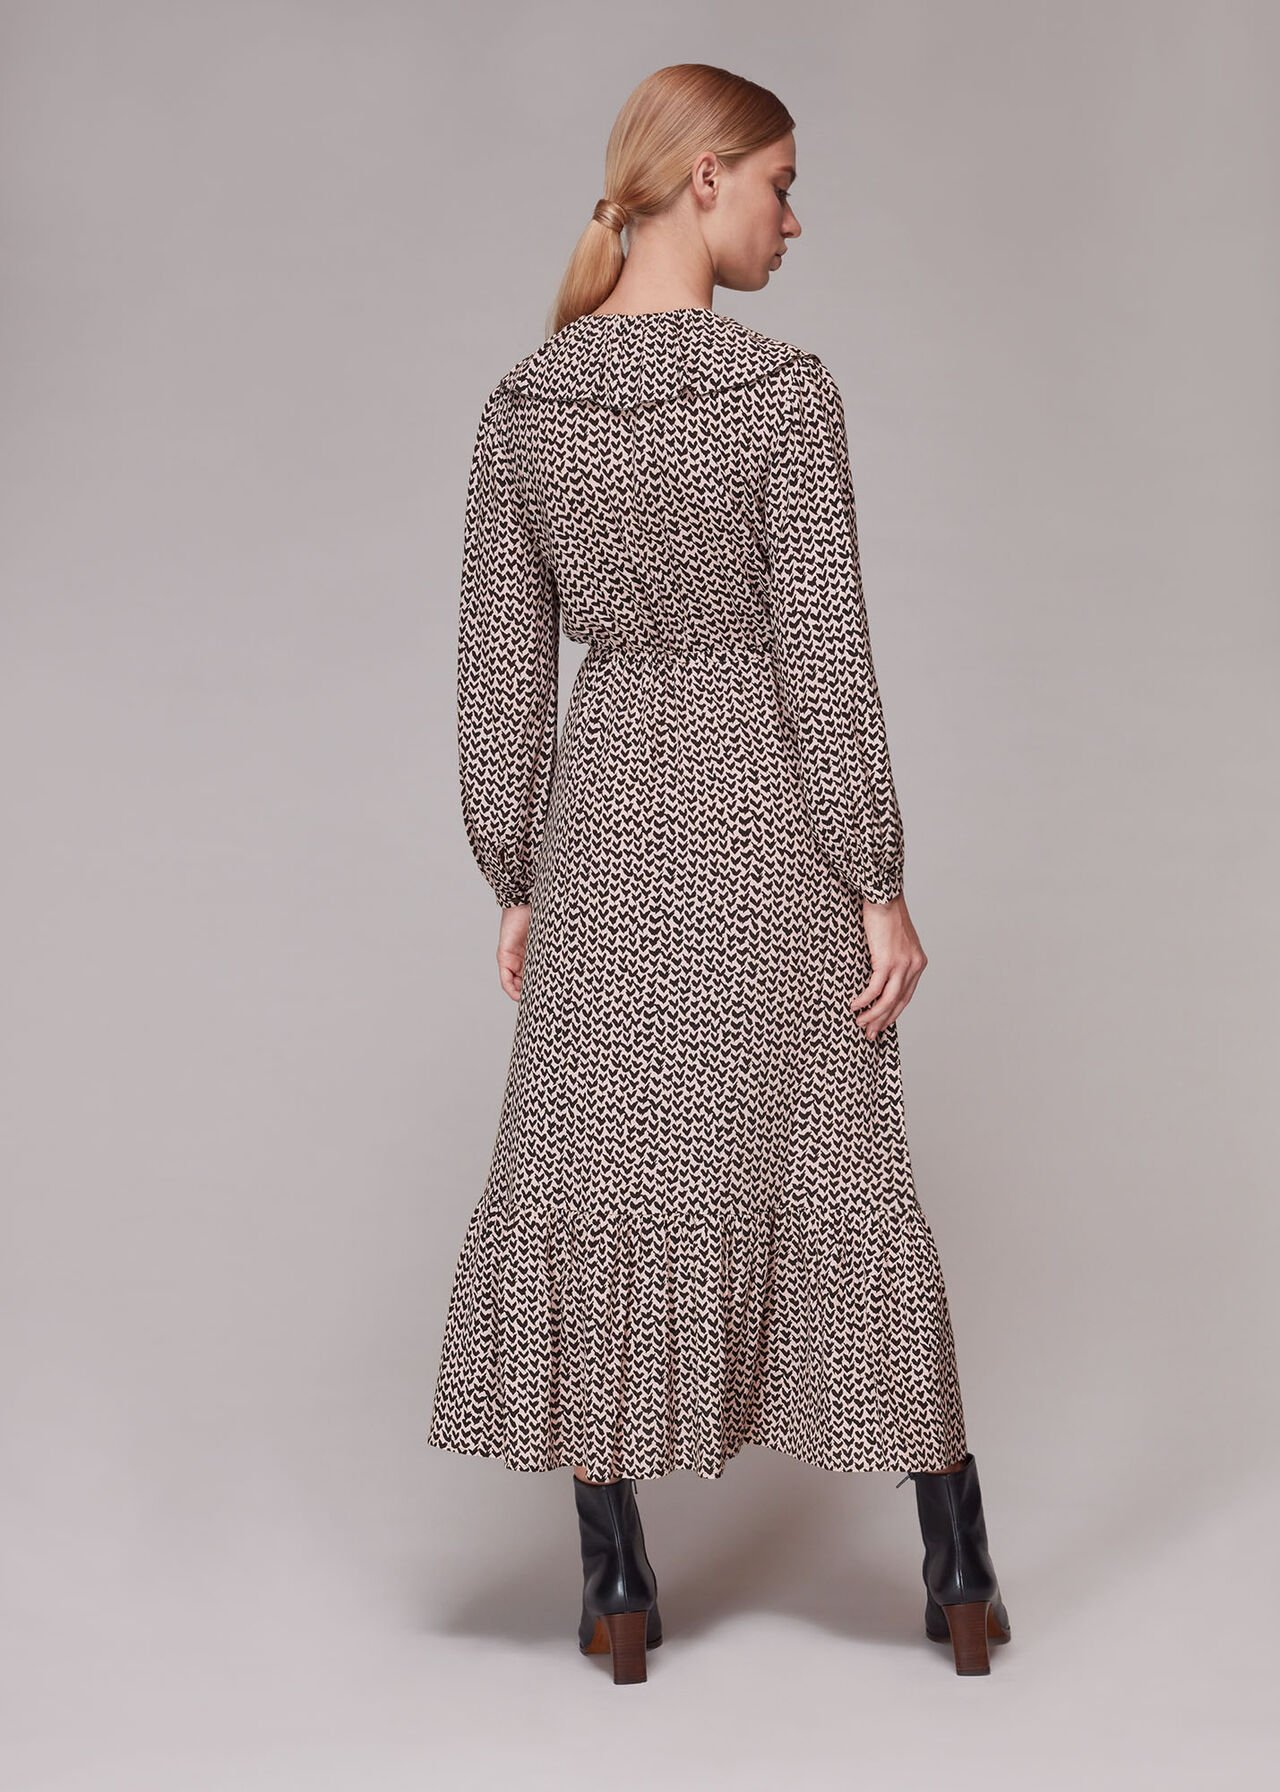 Abstract Heart Print Dress